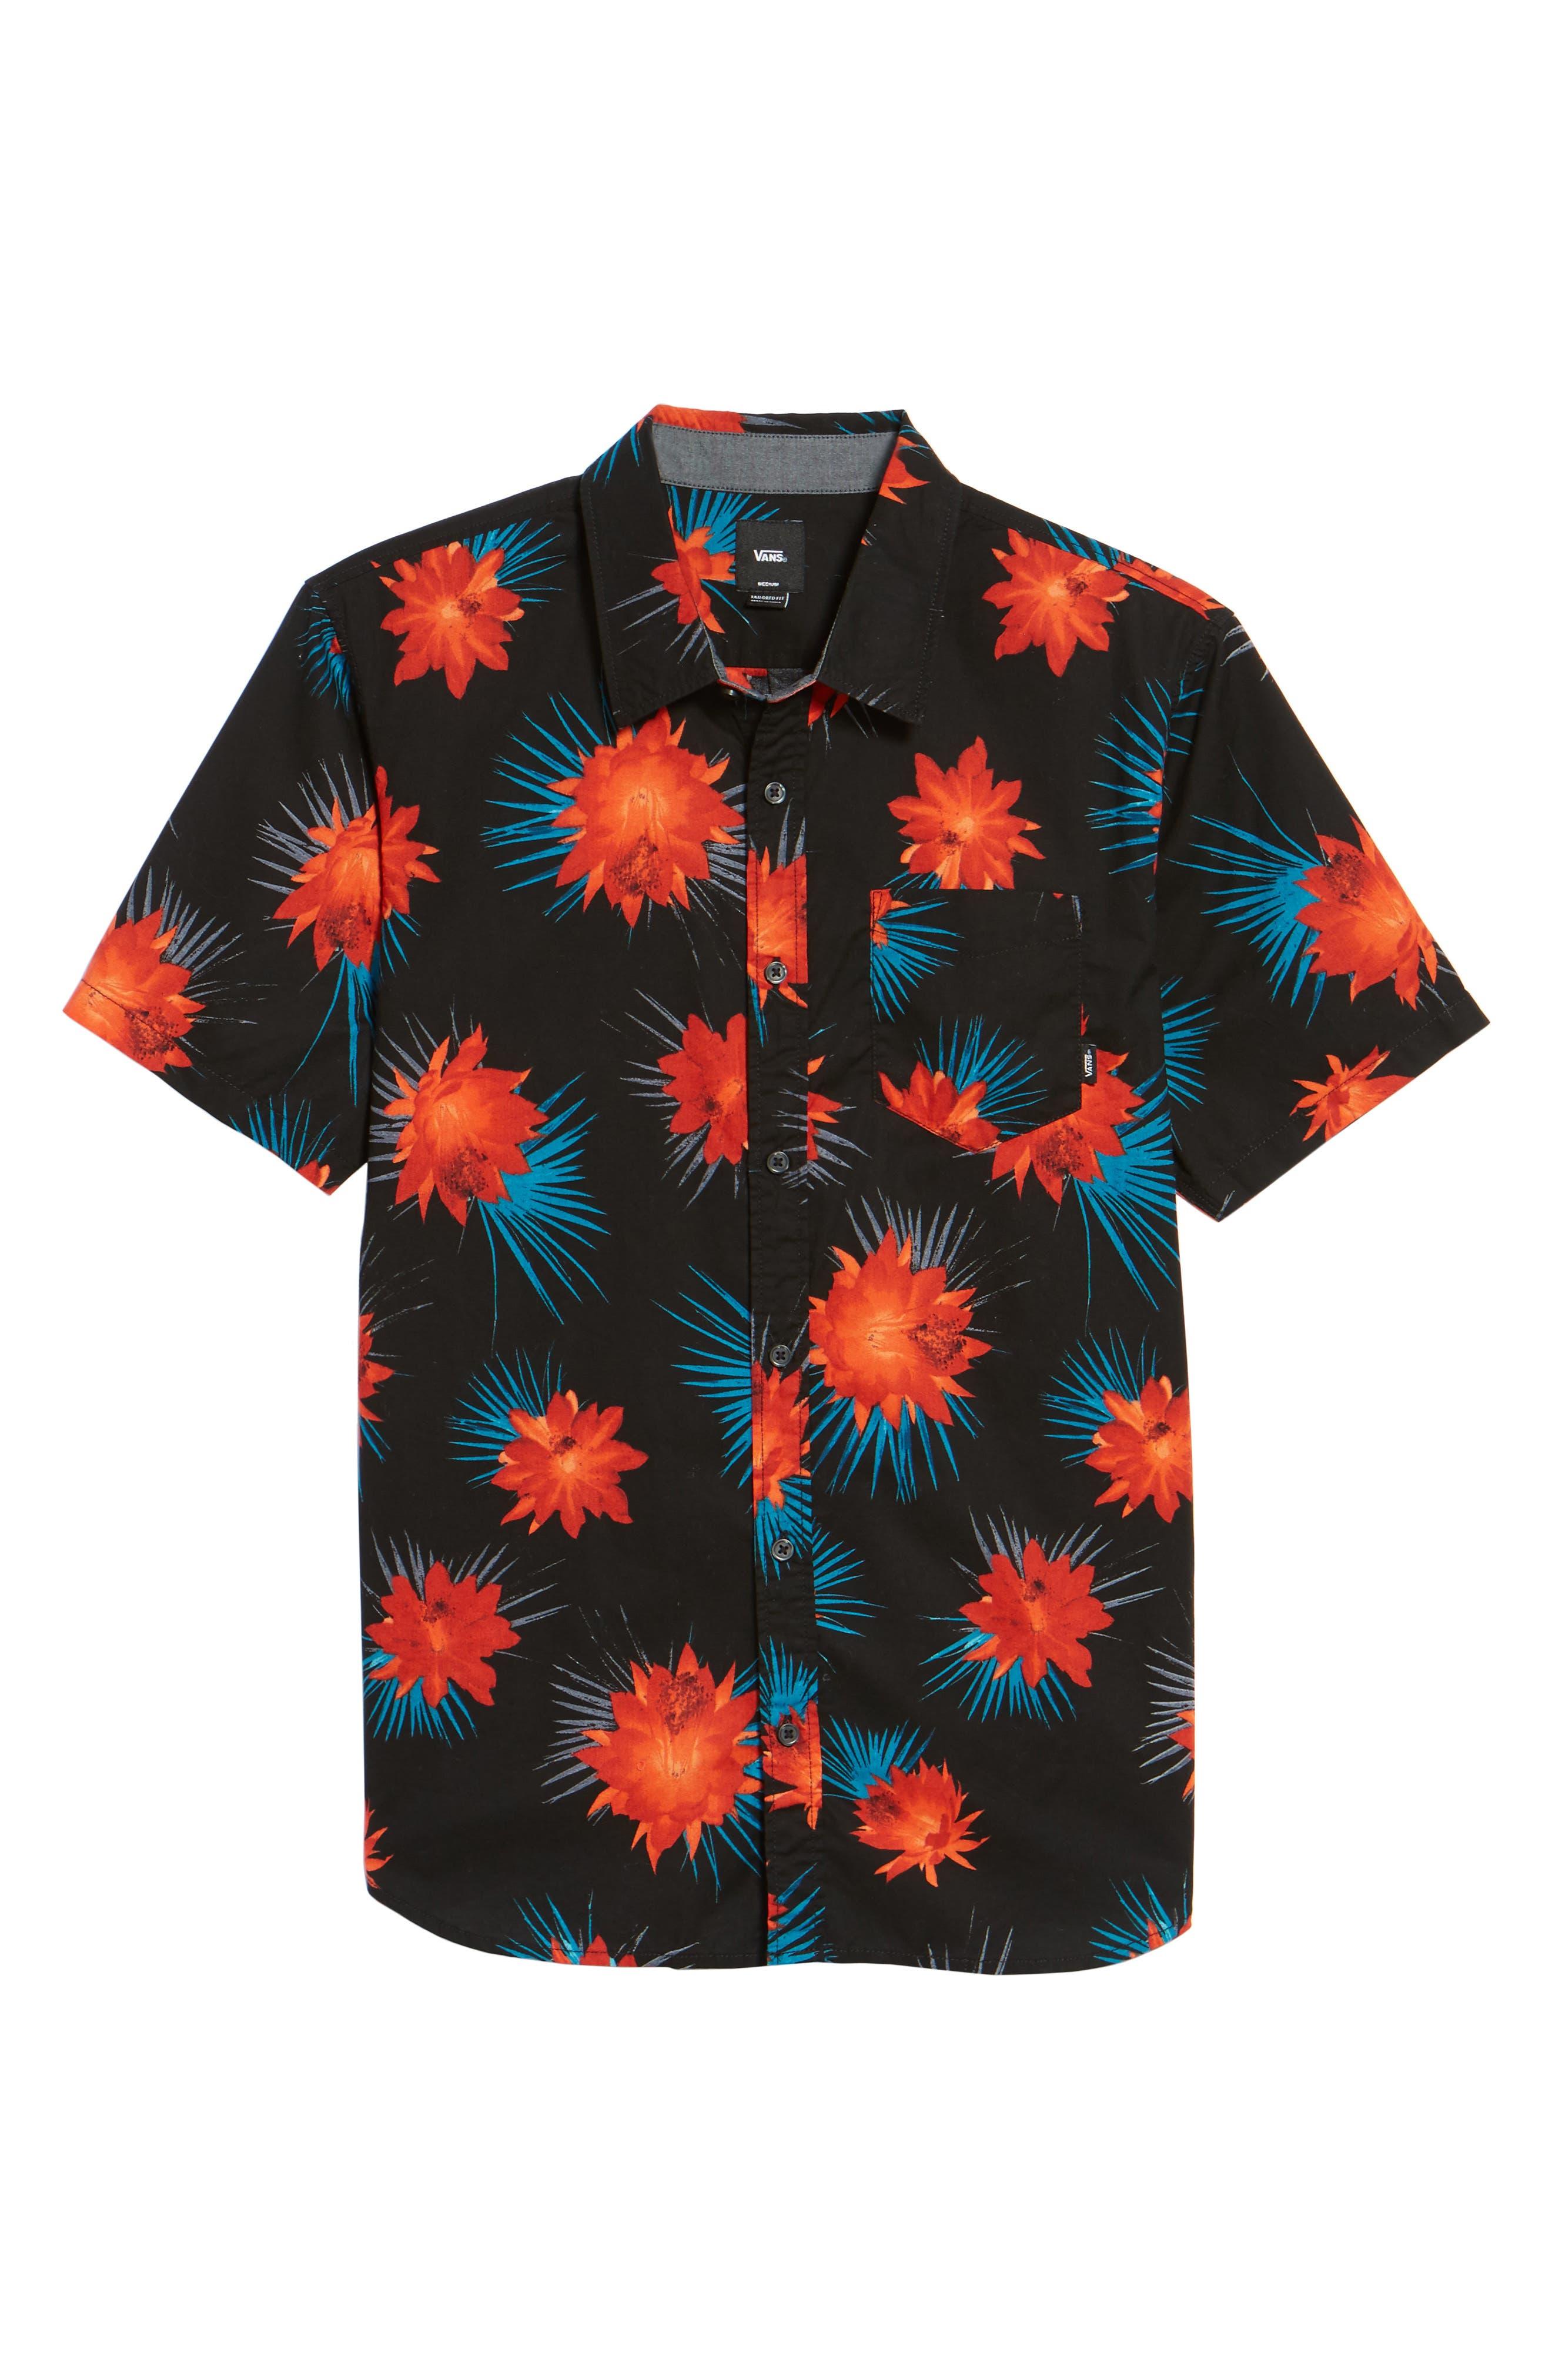 Cultivar Woven Shirt,                             Alternate thumbnail 6, color,                             001